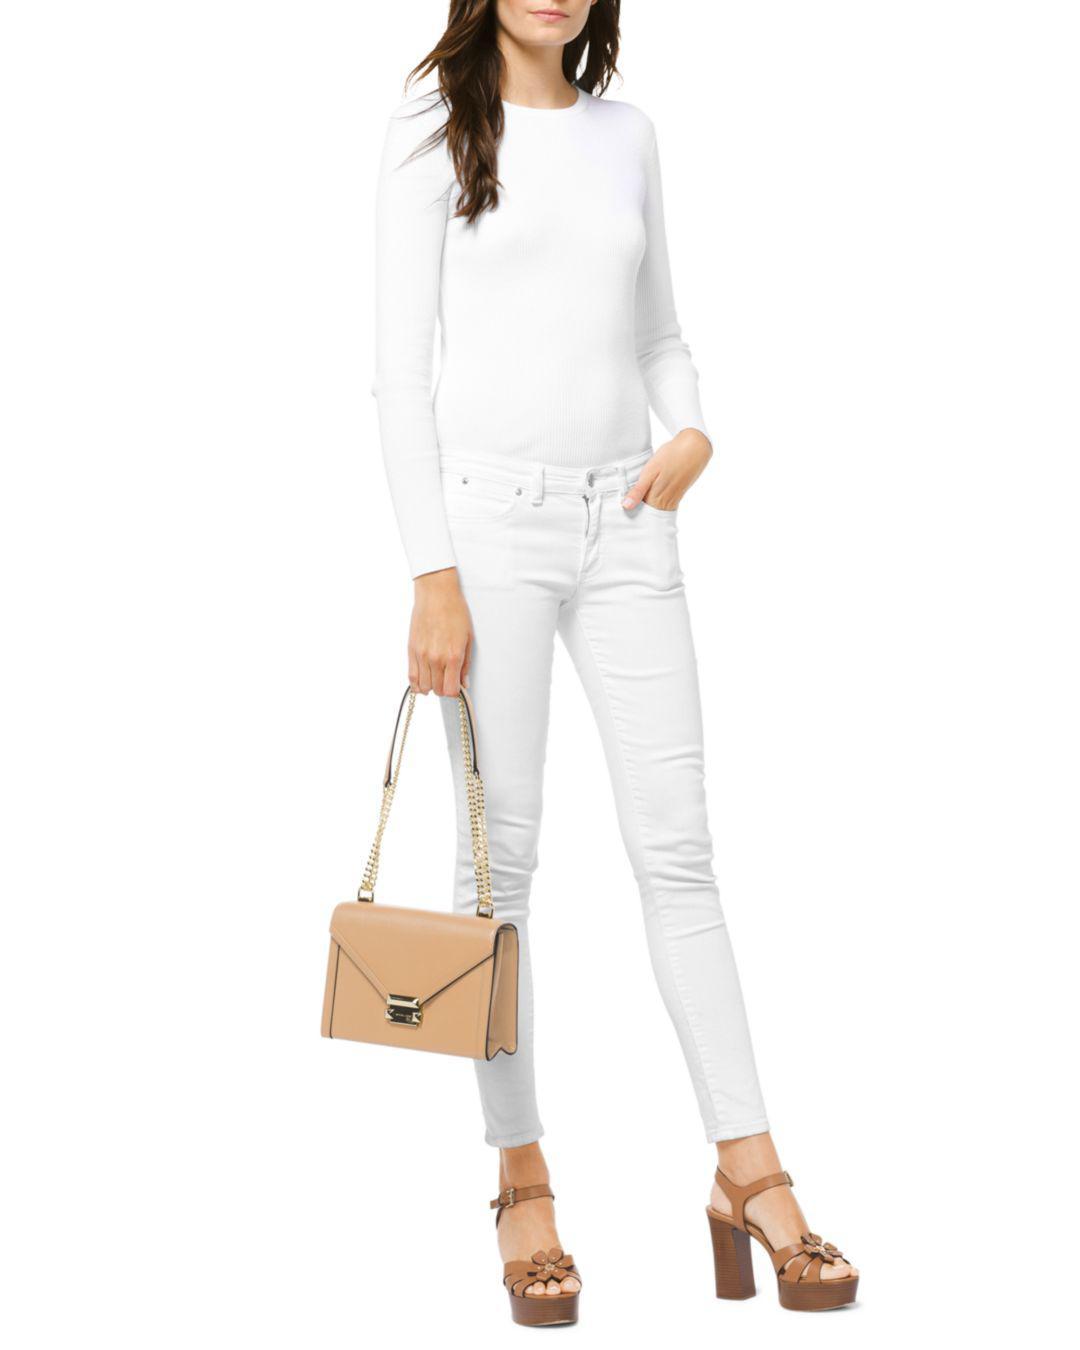 6058f71b27c9 MICHAEL Michael Kors Whitney Large Leather Shoulder Bag - Save 40% - Lyst